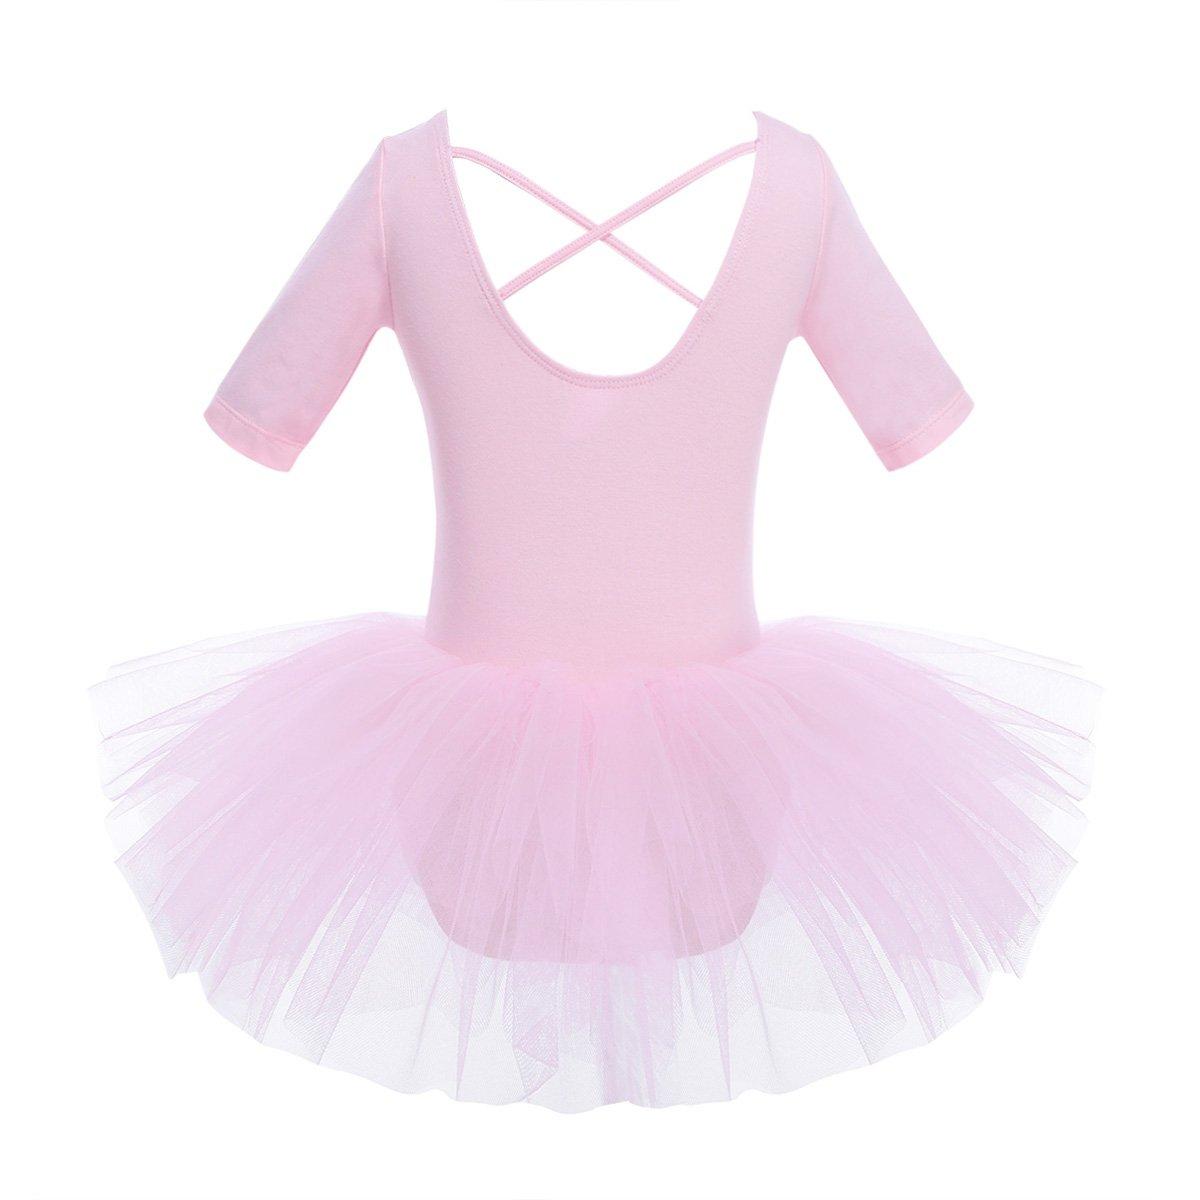 CHICTRY Girls' Short Sleeves Back Detailing Ballet Tutu Leotard Skirt Gymnastics Dance Outfit Clothes